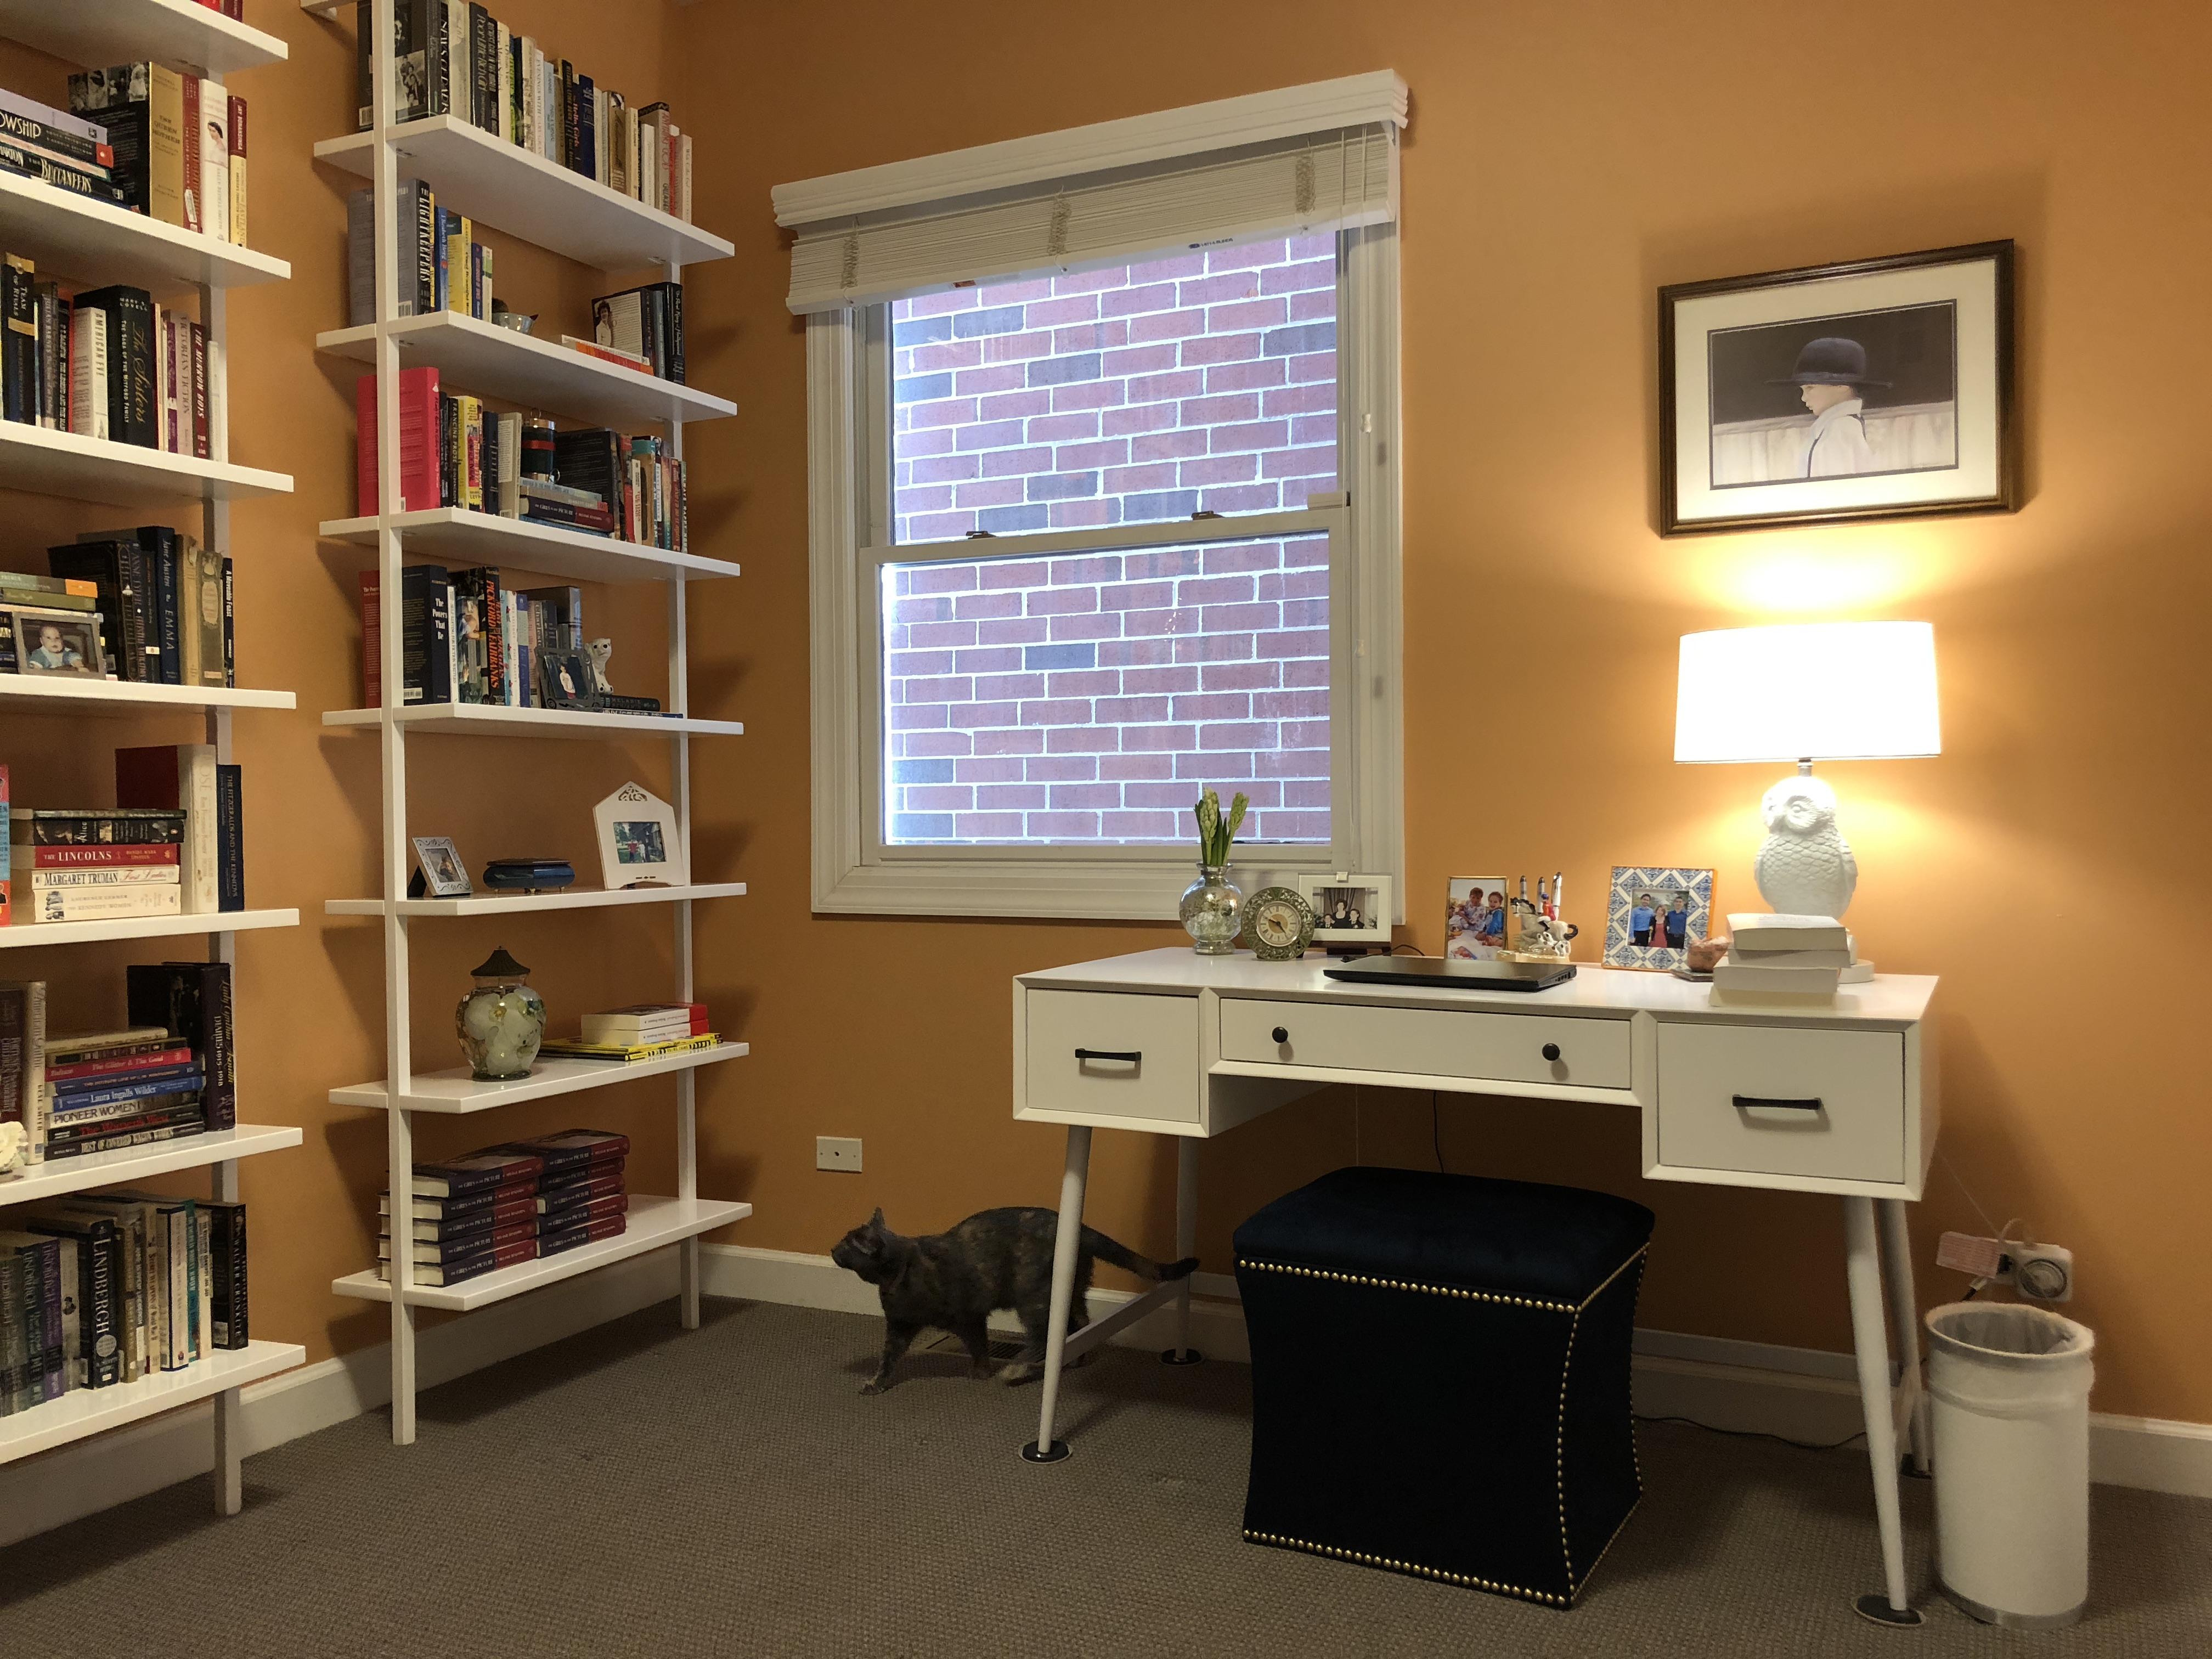 Melanie Benjamin's workspace. A desk faces a wall near an open window.